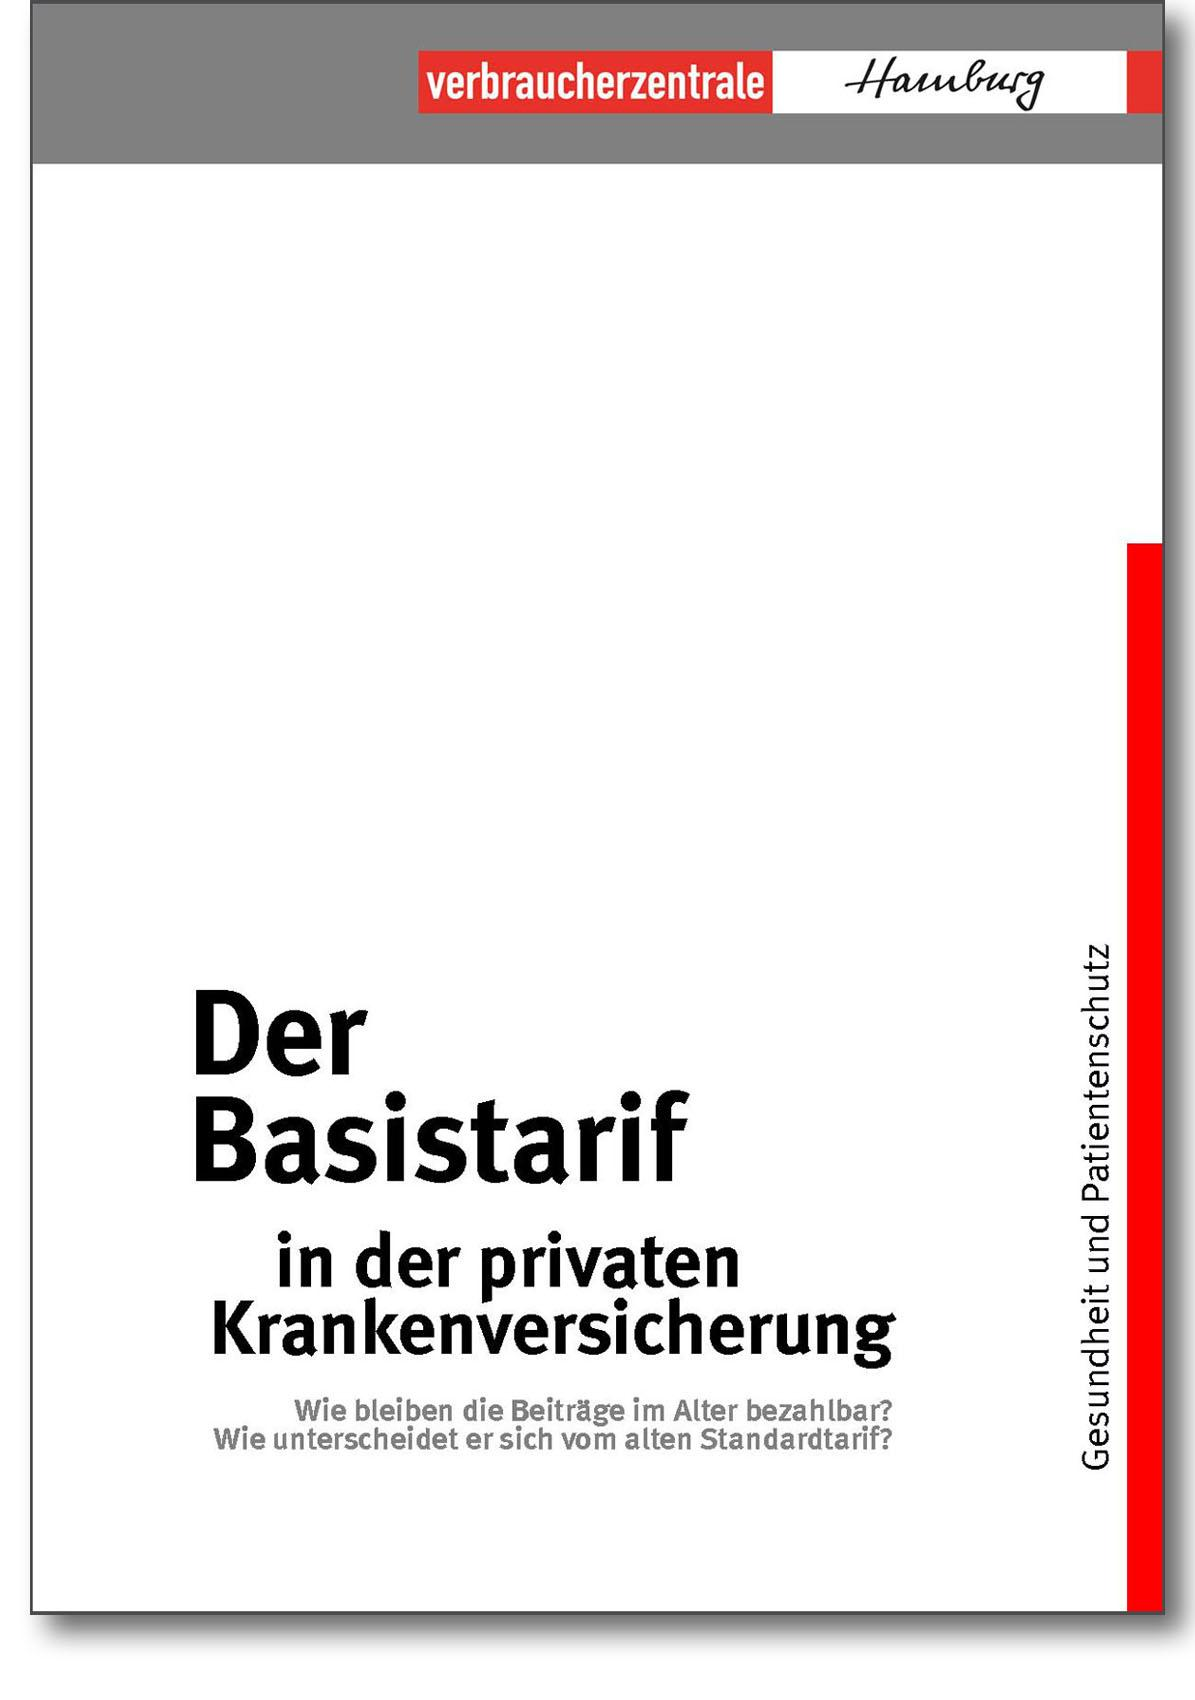 Der Basistarif